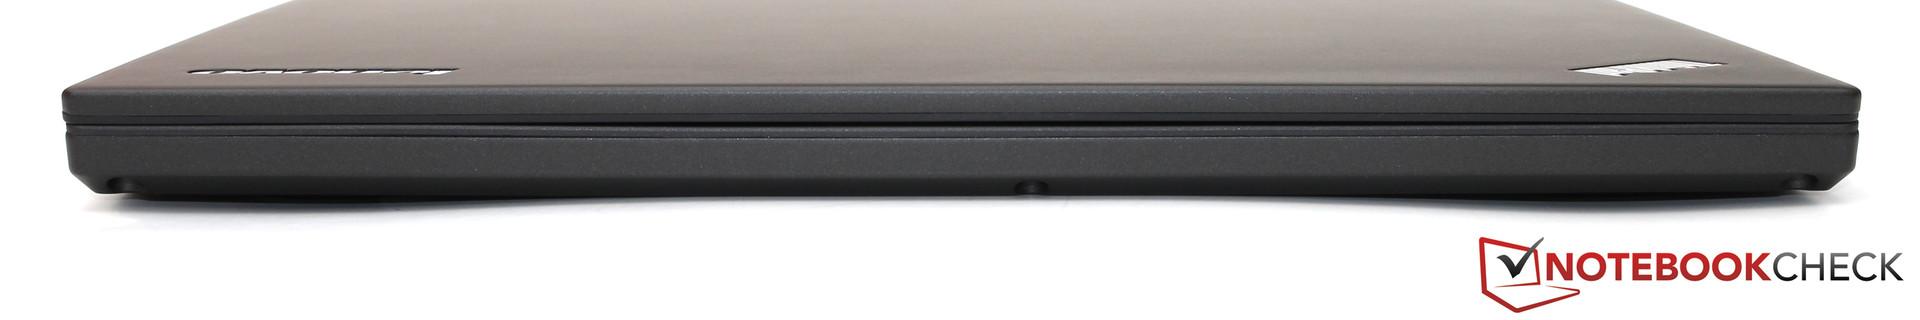 Face Off: Lenovo ThinkPad T450s vs  HP EliteBook Folio 1040